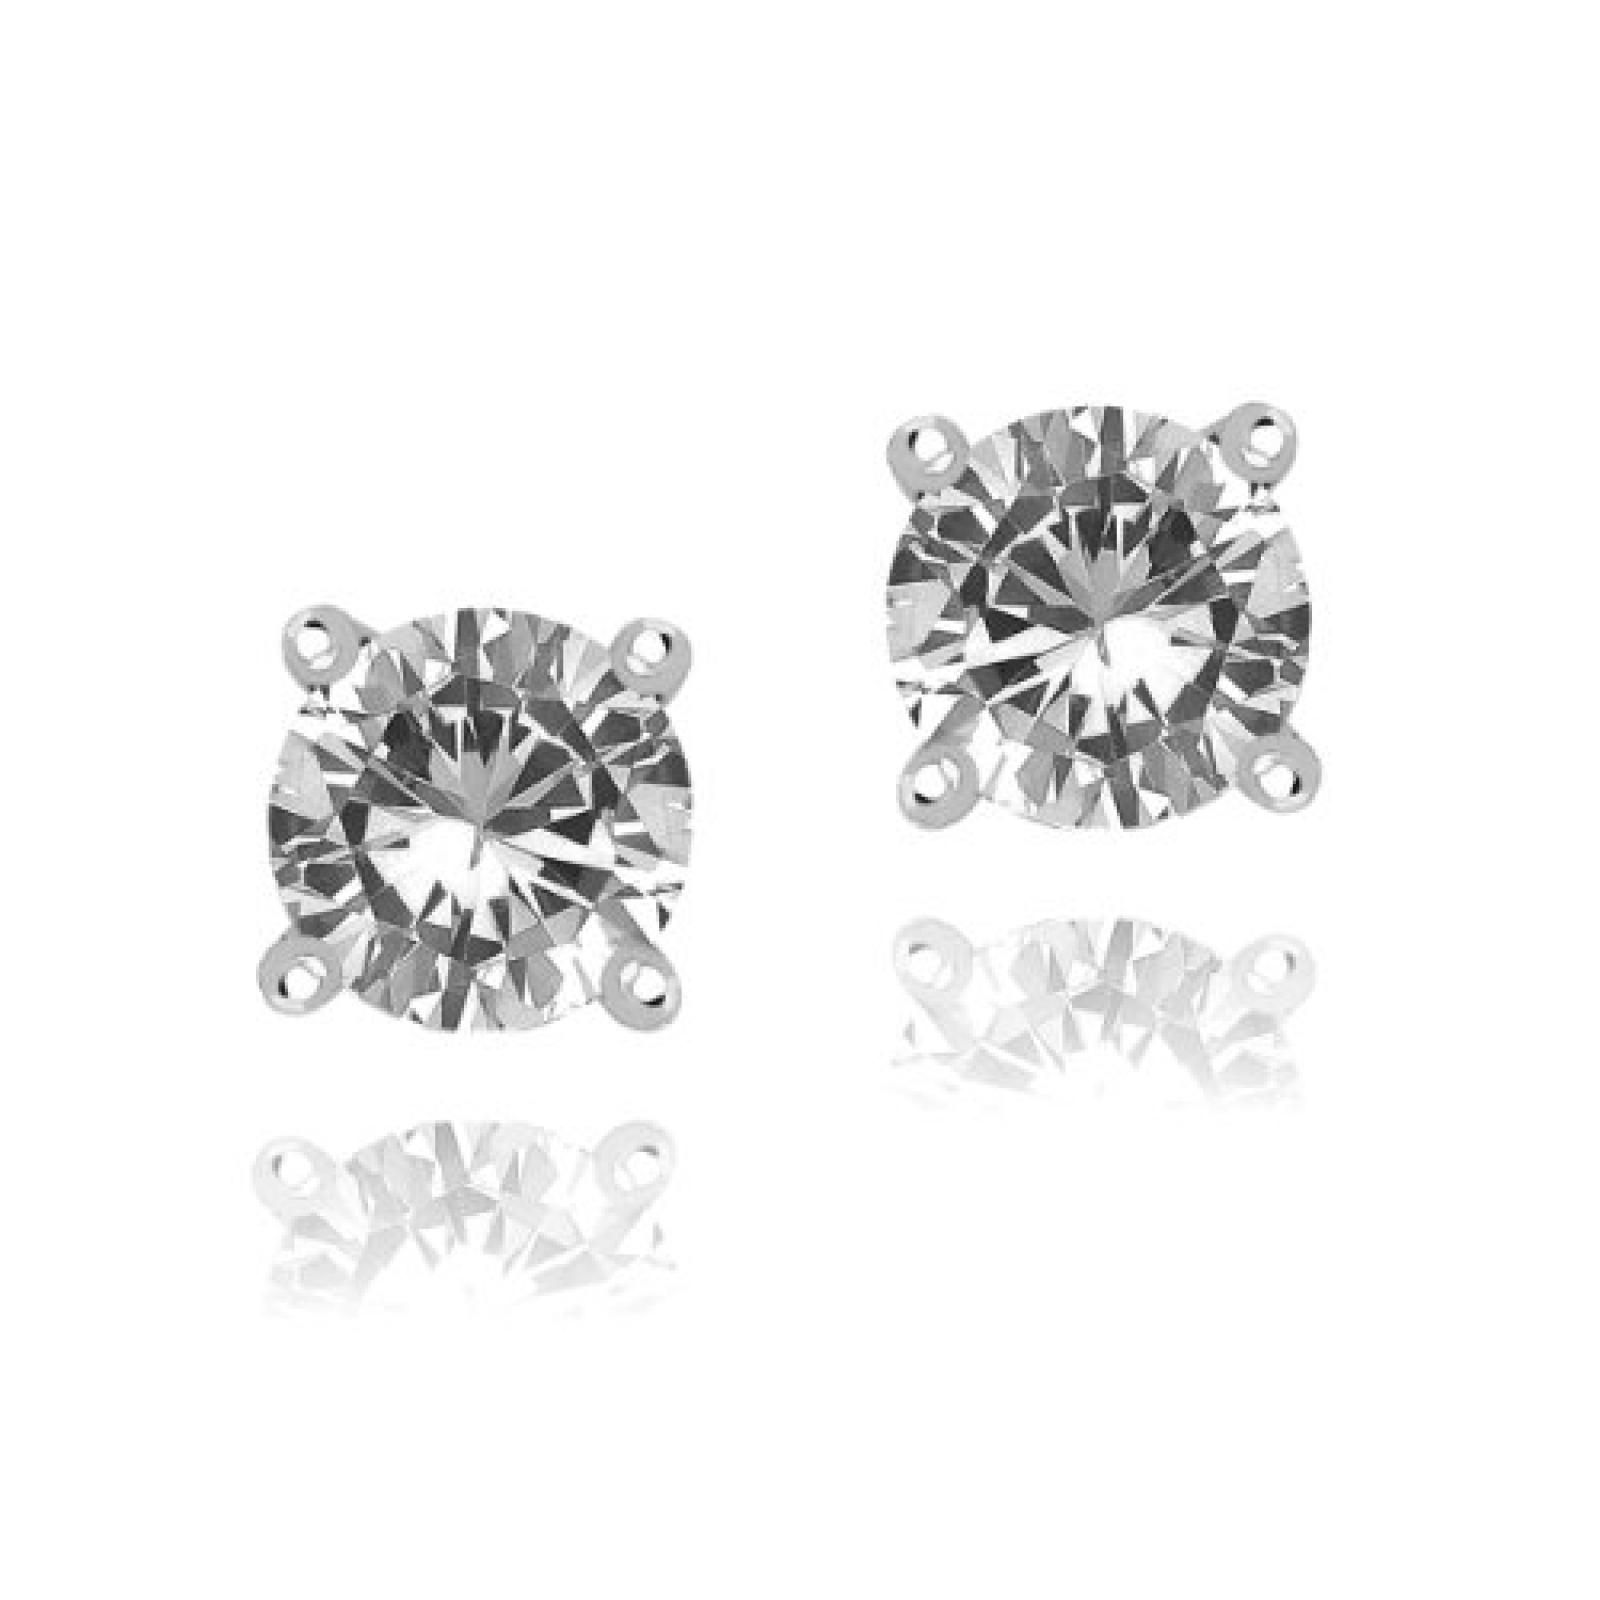 Rafaela Donata Damen-Ohrstecker Classic Collection 925 Sterling Silber Zirkonia weiß 60837053